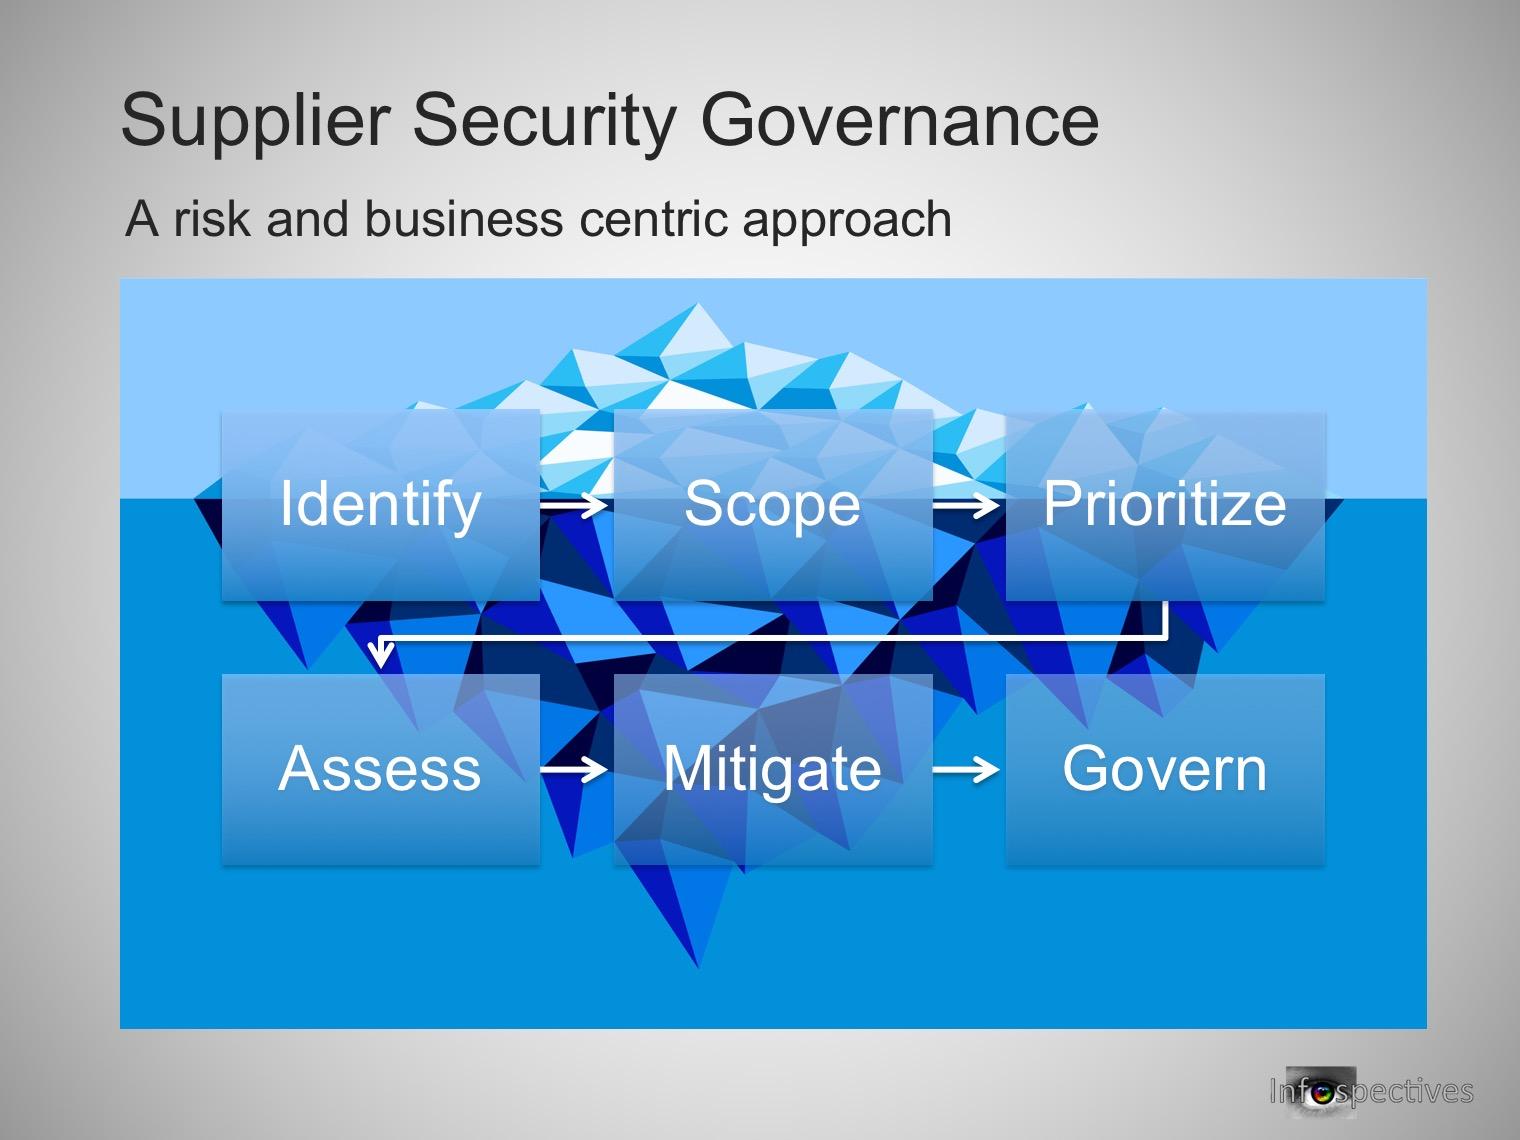 Supplier Security Governance 23rd Nov 2015